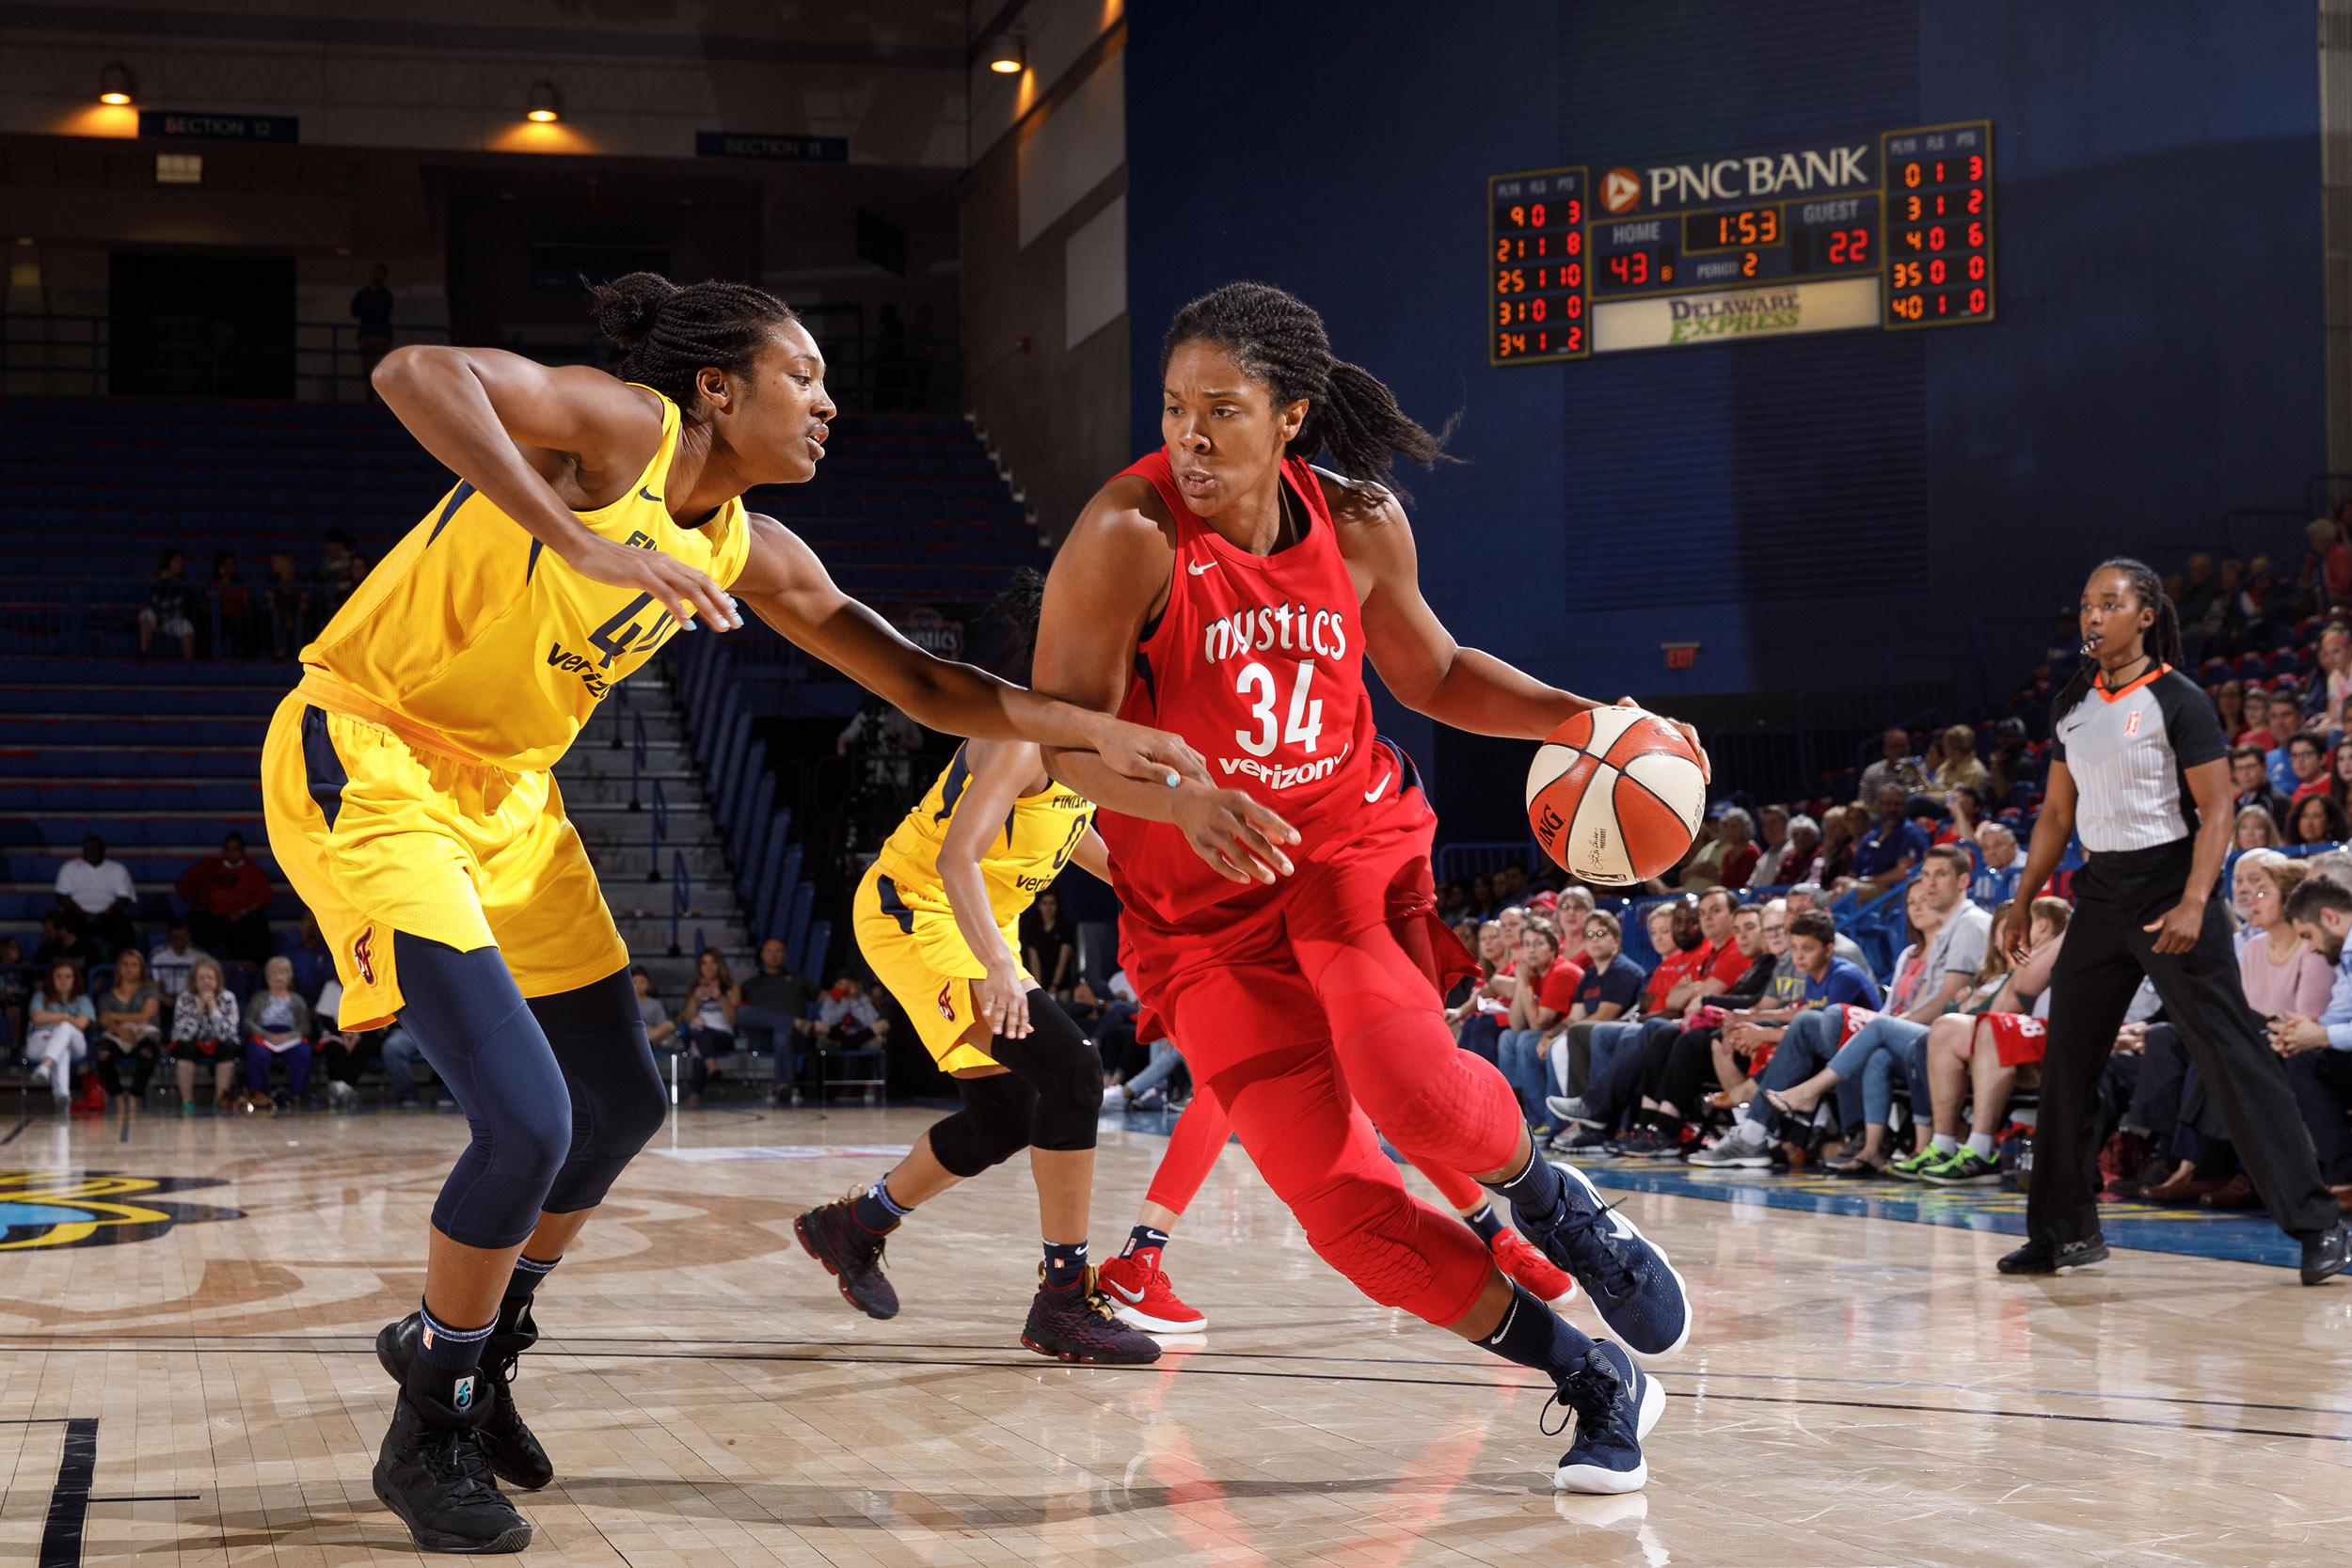 Fever-Mystics-Delaware-12may2018-WNBA-Gosling-19.JPG